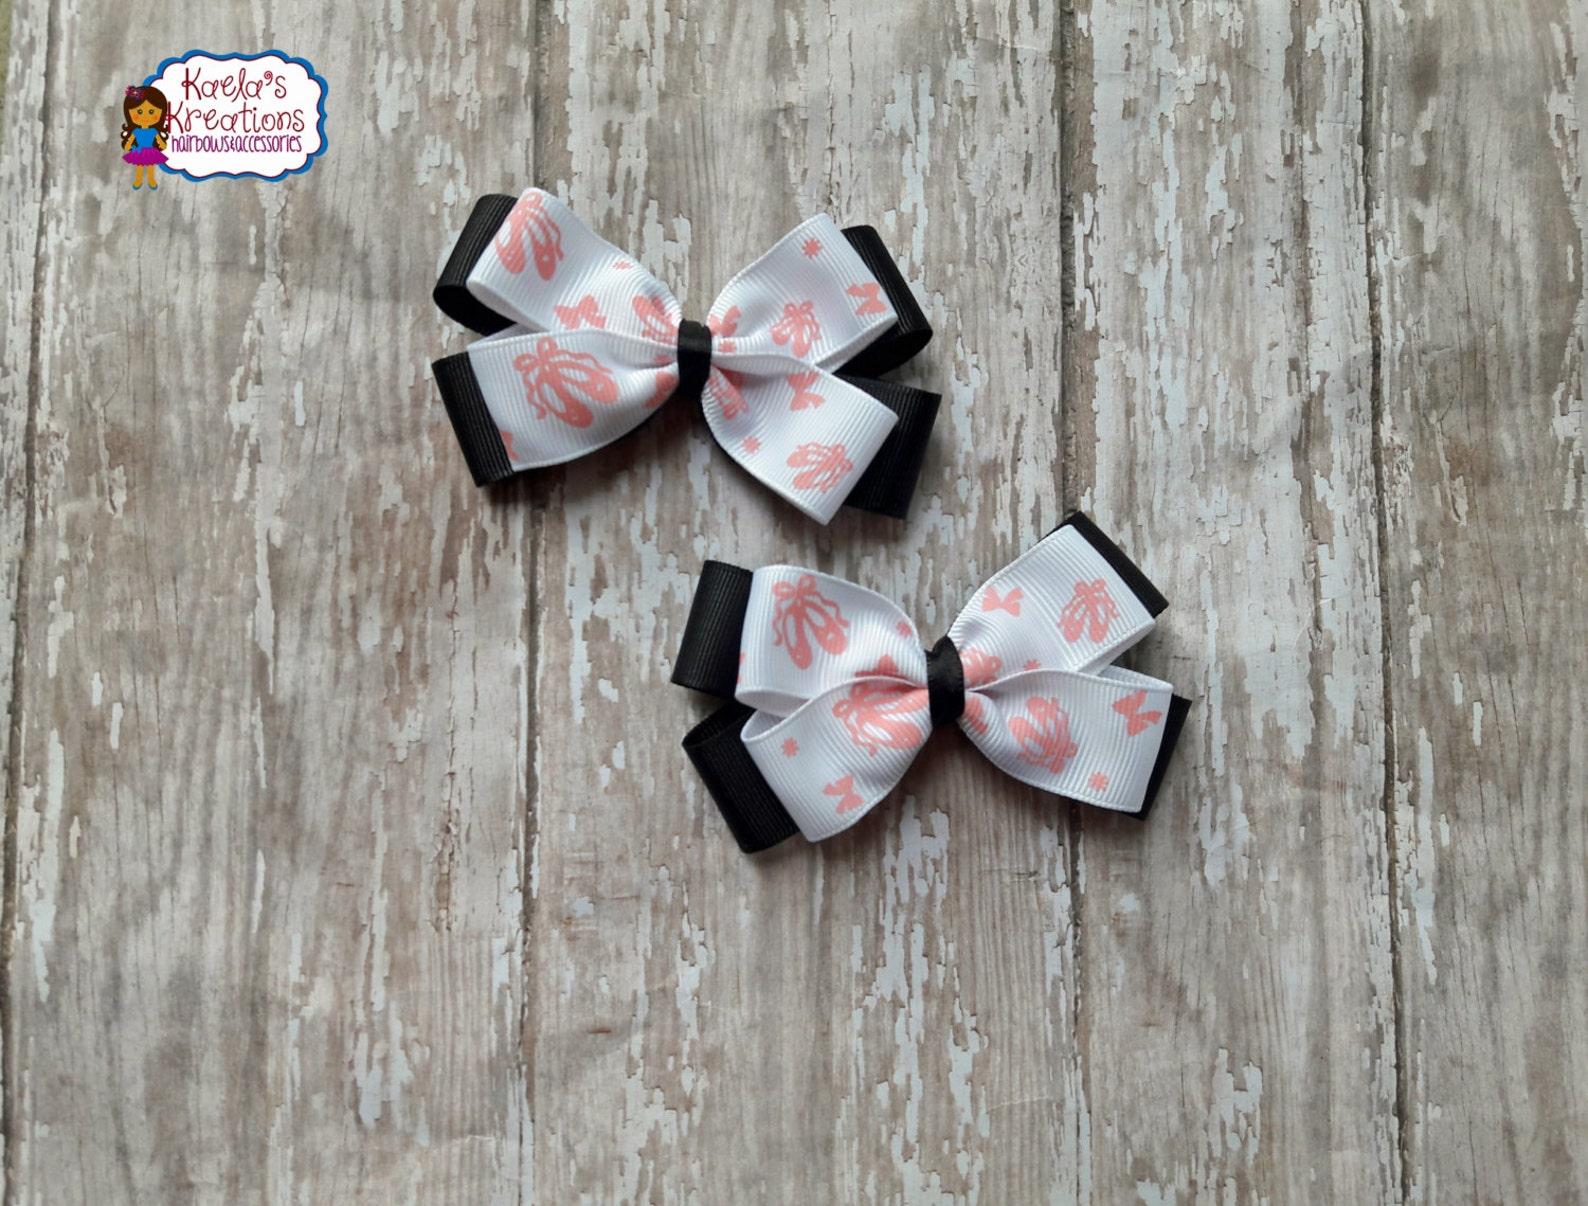 ballet hair bows,pink and black ballet hair bows,ballet bows,black and pink ballet hair bows,ballet clips,ballet